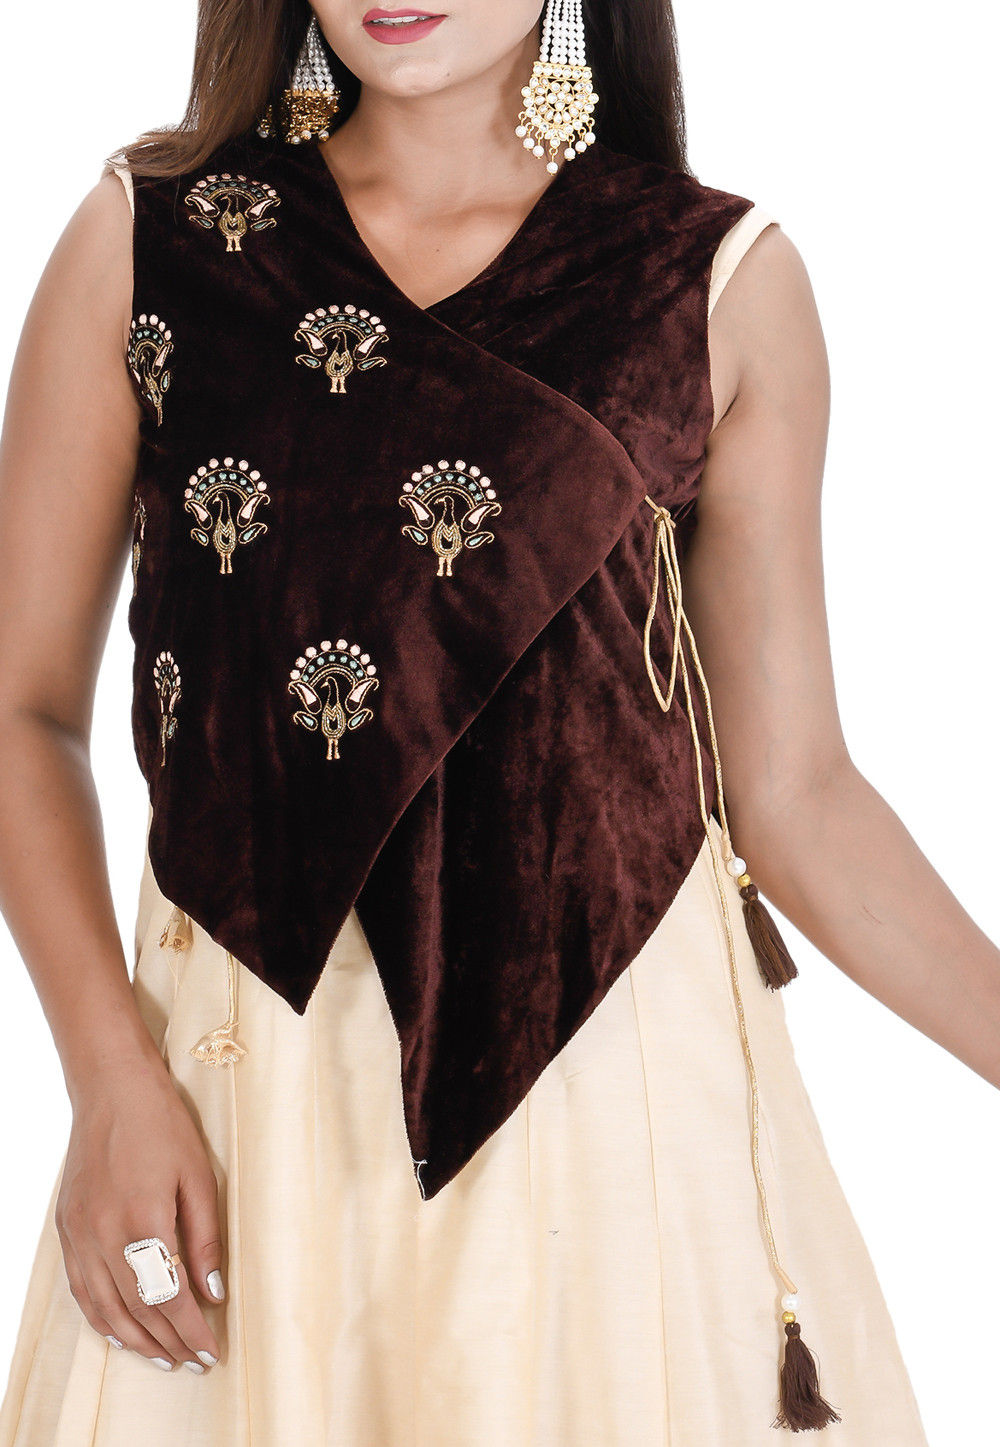 Beige and Brown Cotton Silk Kurti Brown Shawl /& Trouser A-Line Shirt Printed Trouser New Collection Beige Kurti Jamawar Shawl